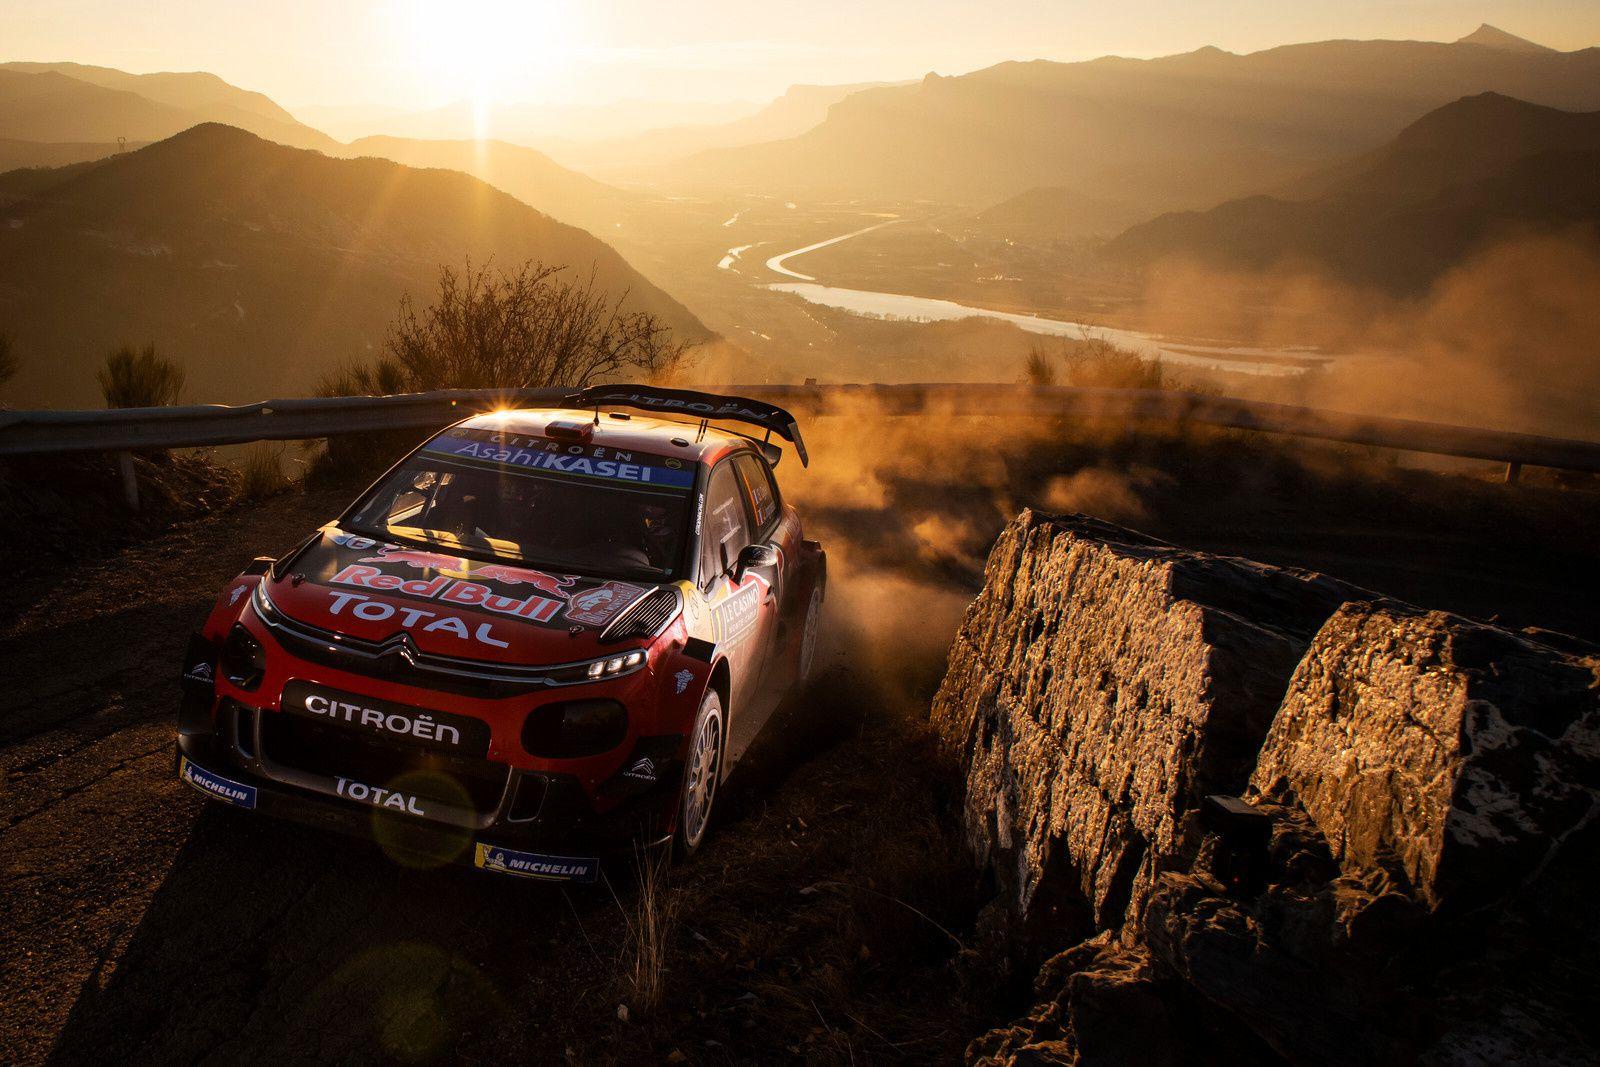 VIDEO : HISTORIC 100TH WRC WIN FOR CITROËN !